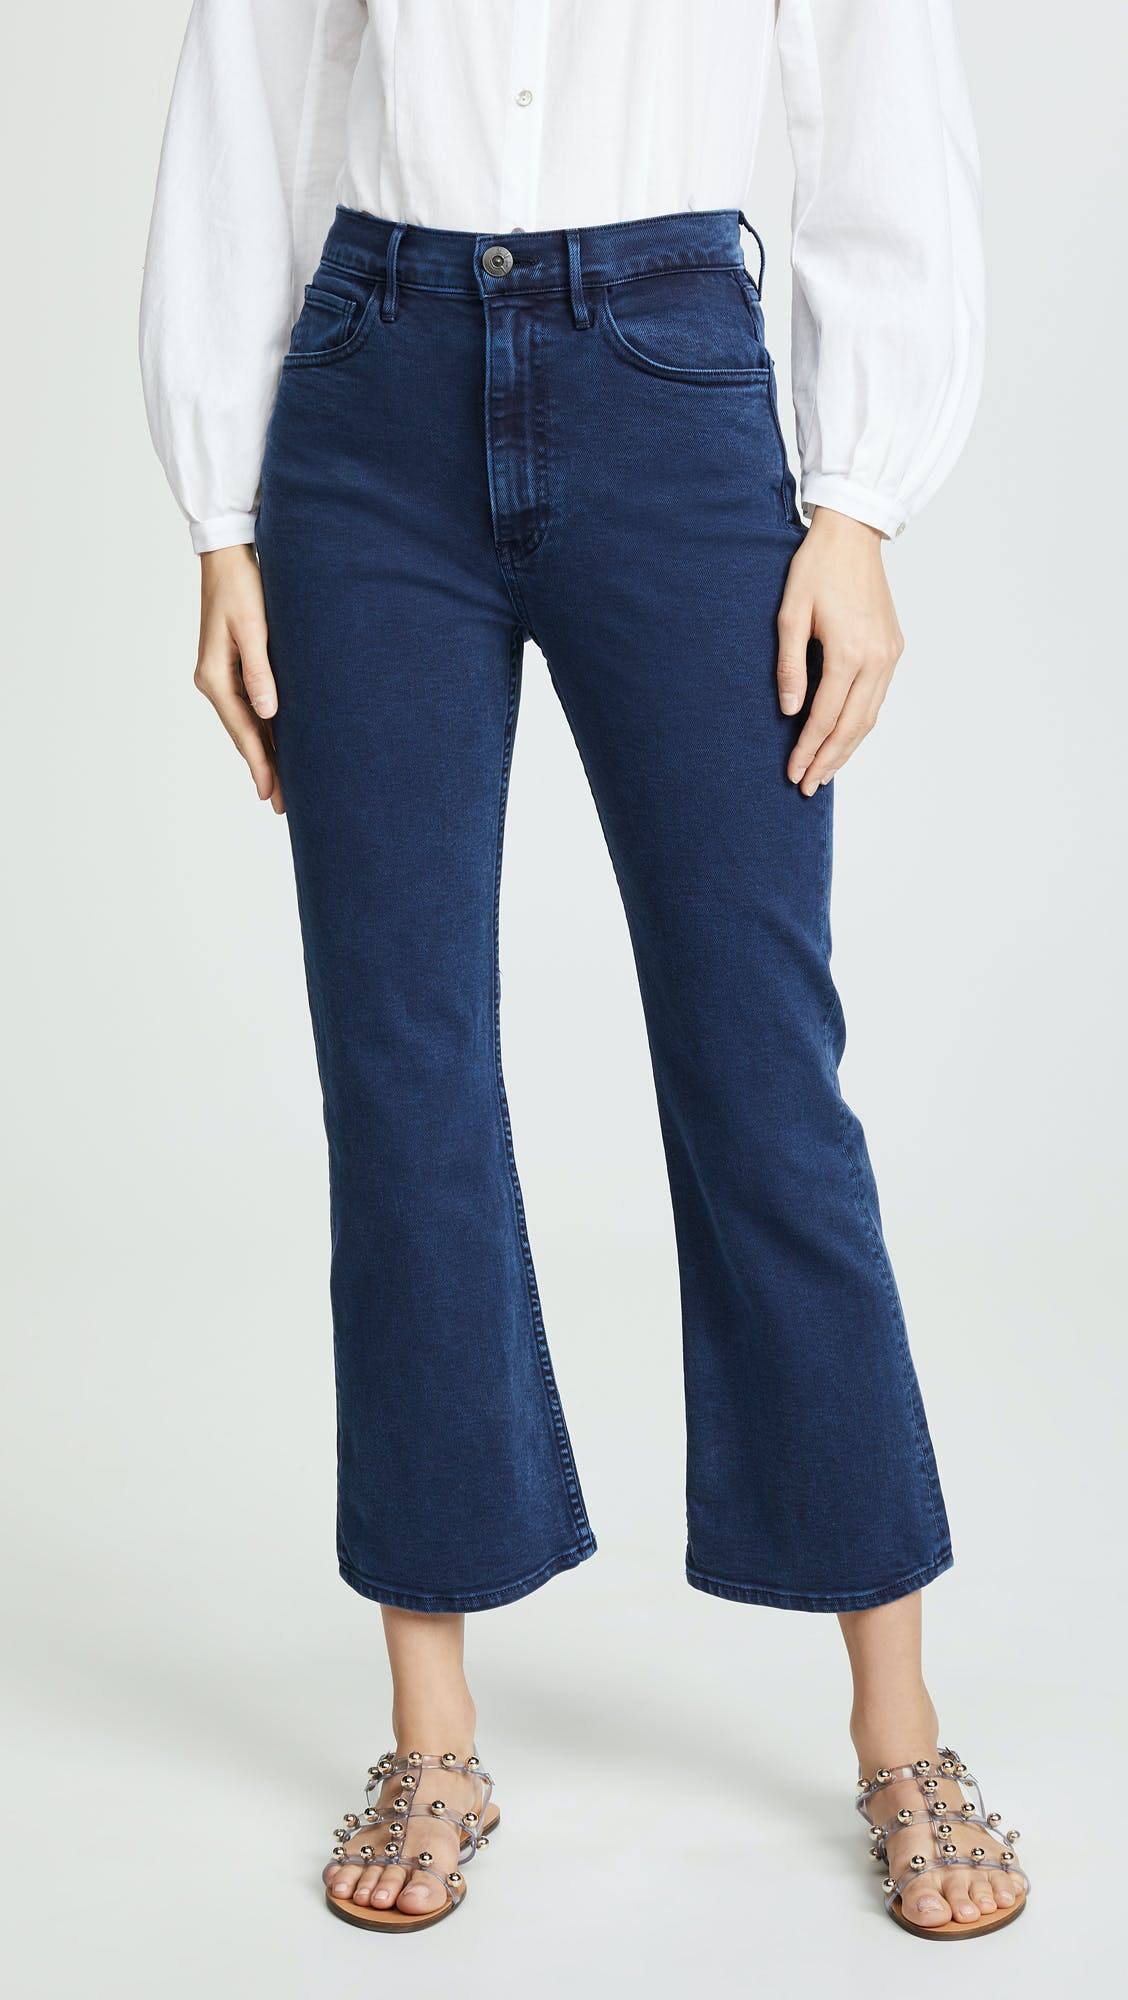 Empire Crop Jeans